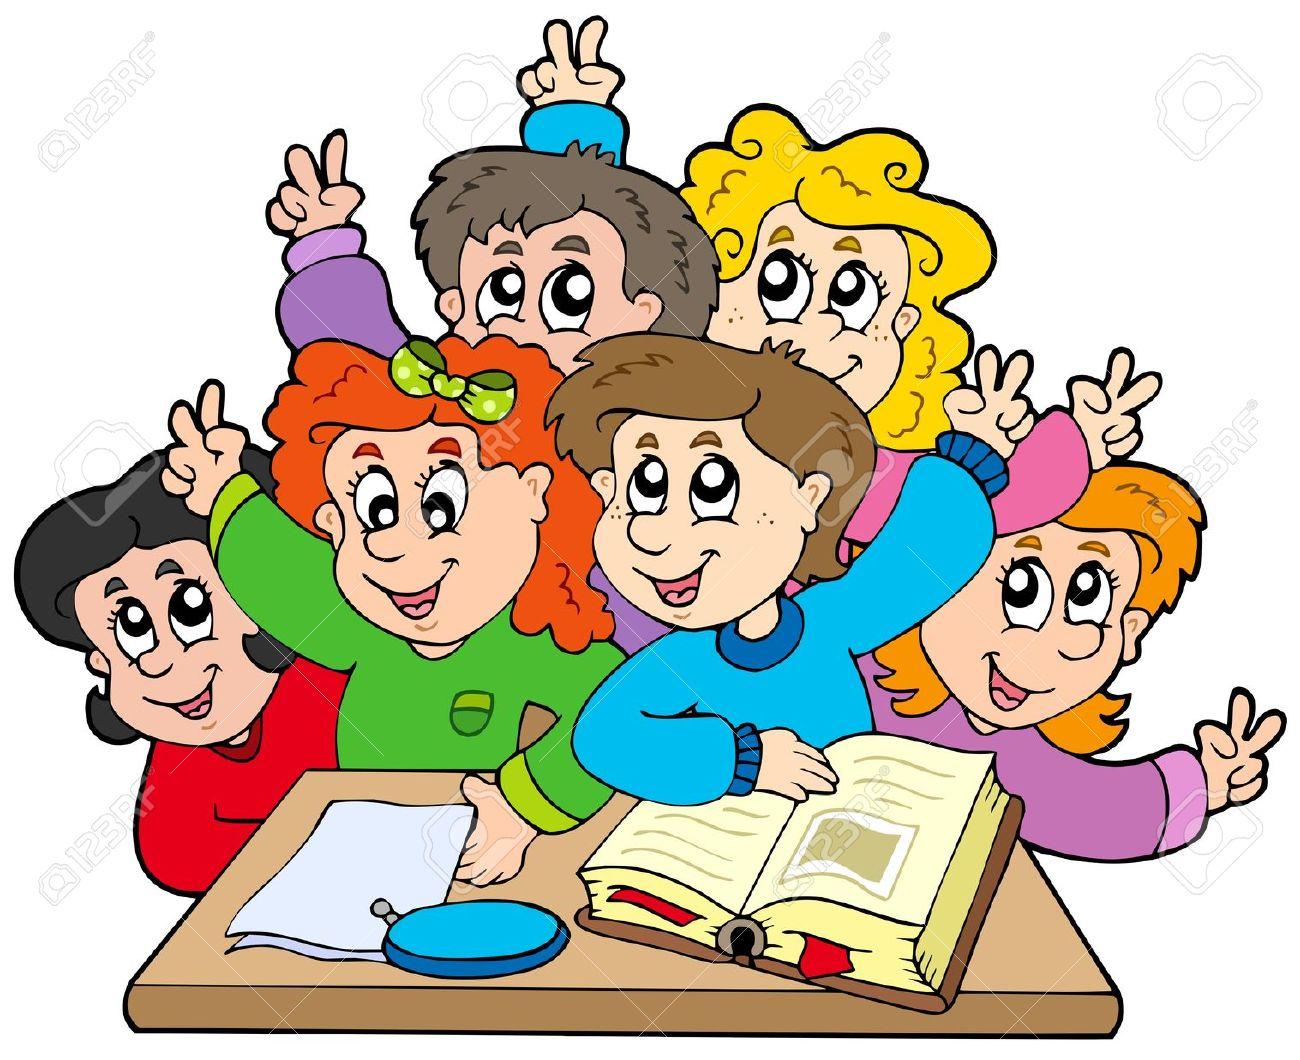 1300x1060 Pupils Classroom Clipart, Explore Pictures